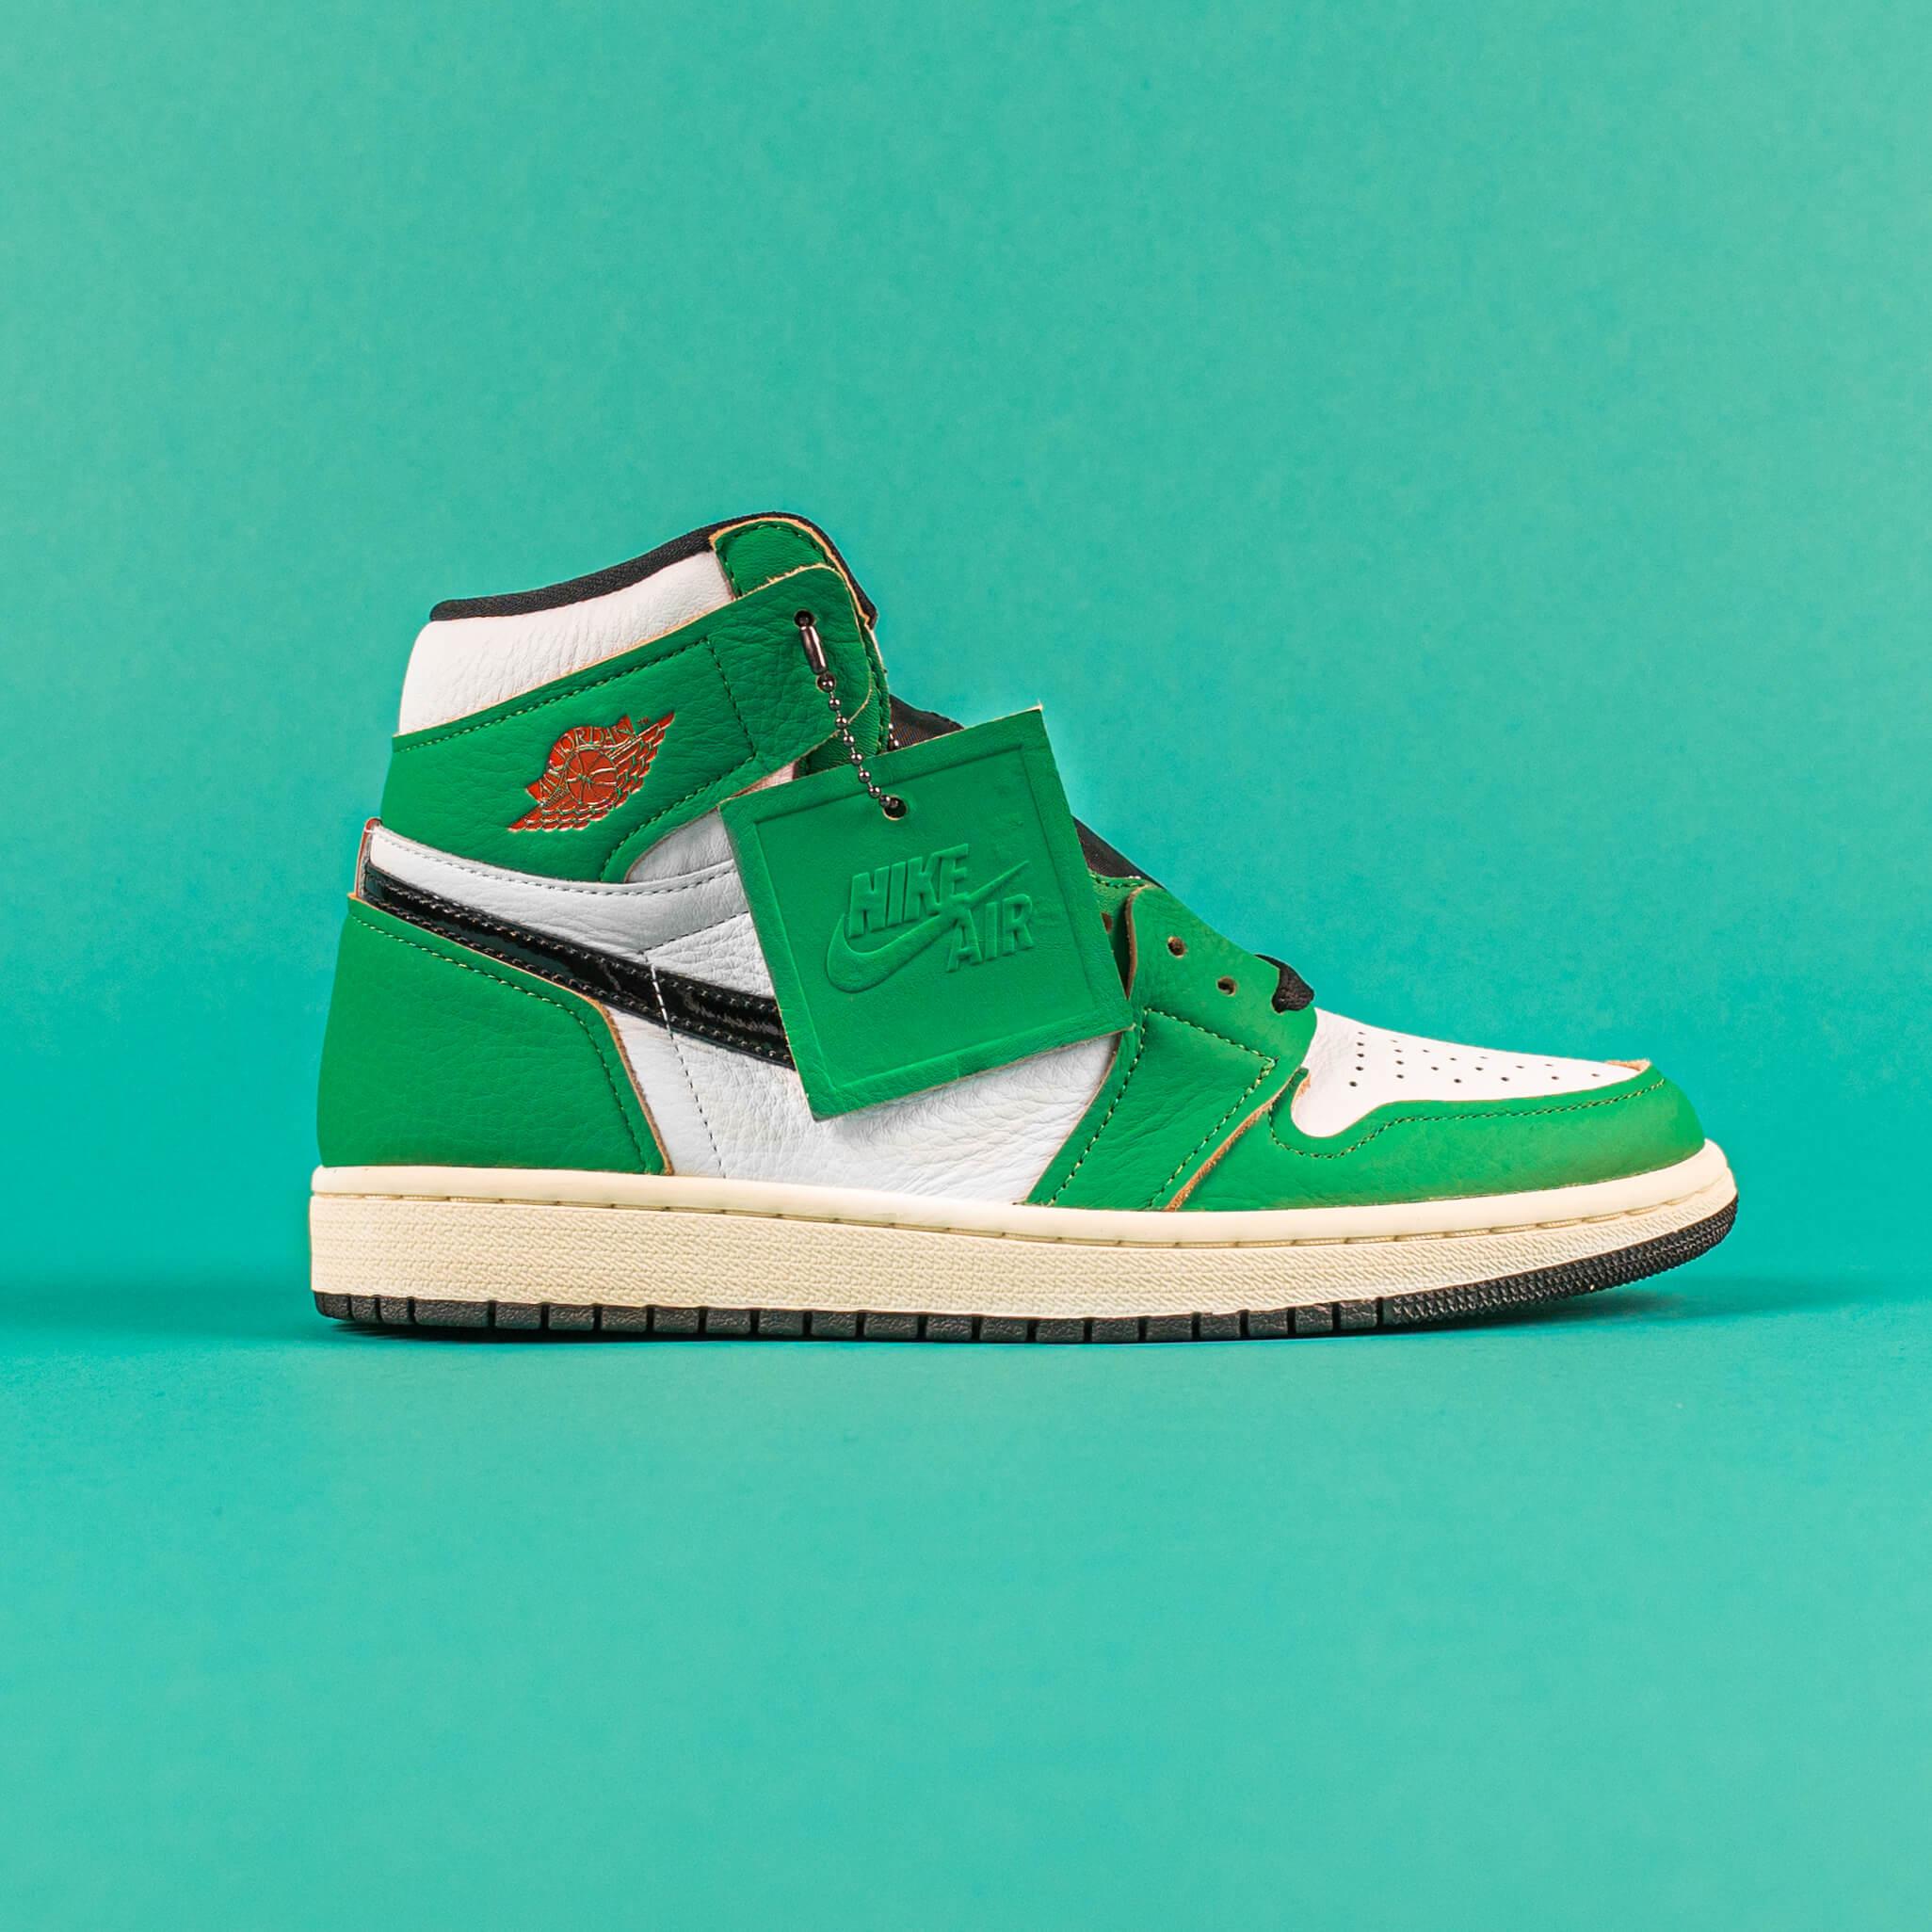 Air Jordan 1 High